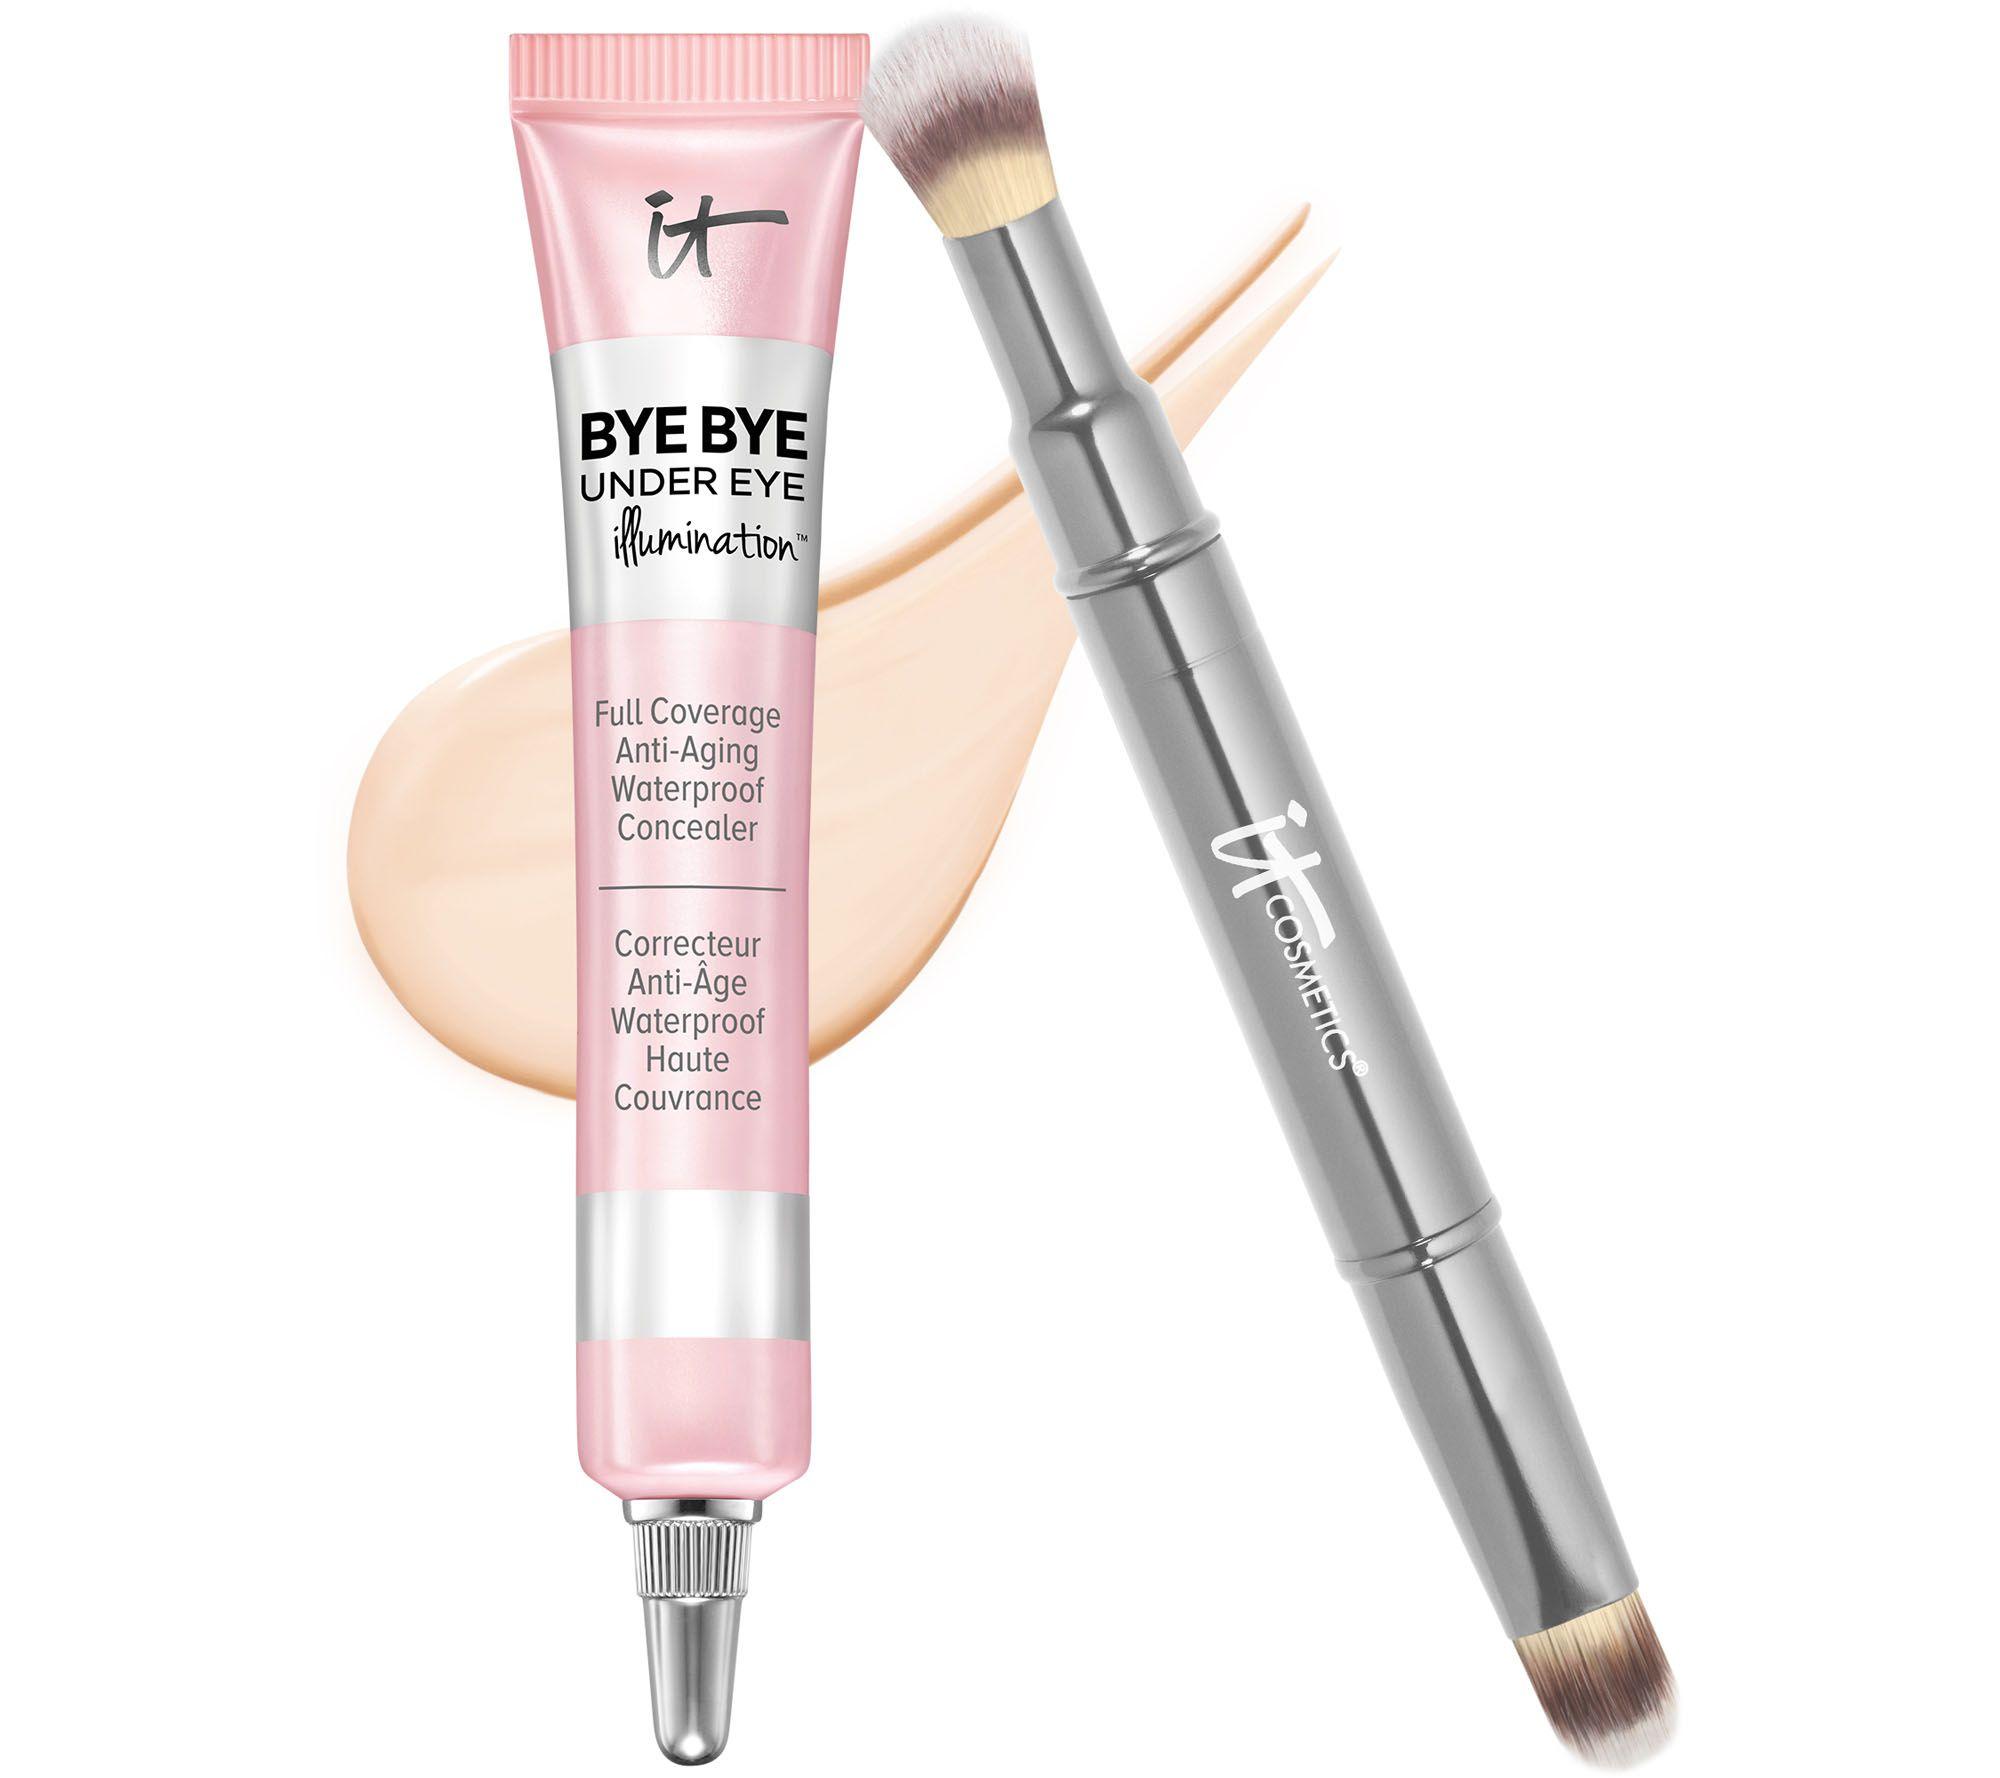 It Cosmetics Bye Bye Under Eye Illumination With Brush Page 1